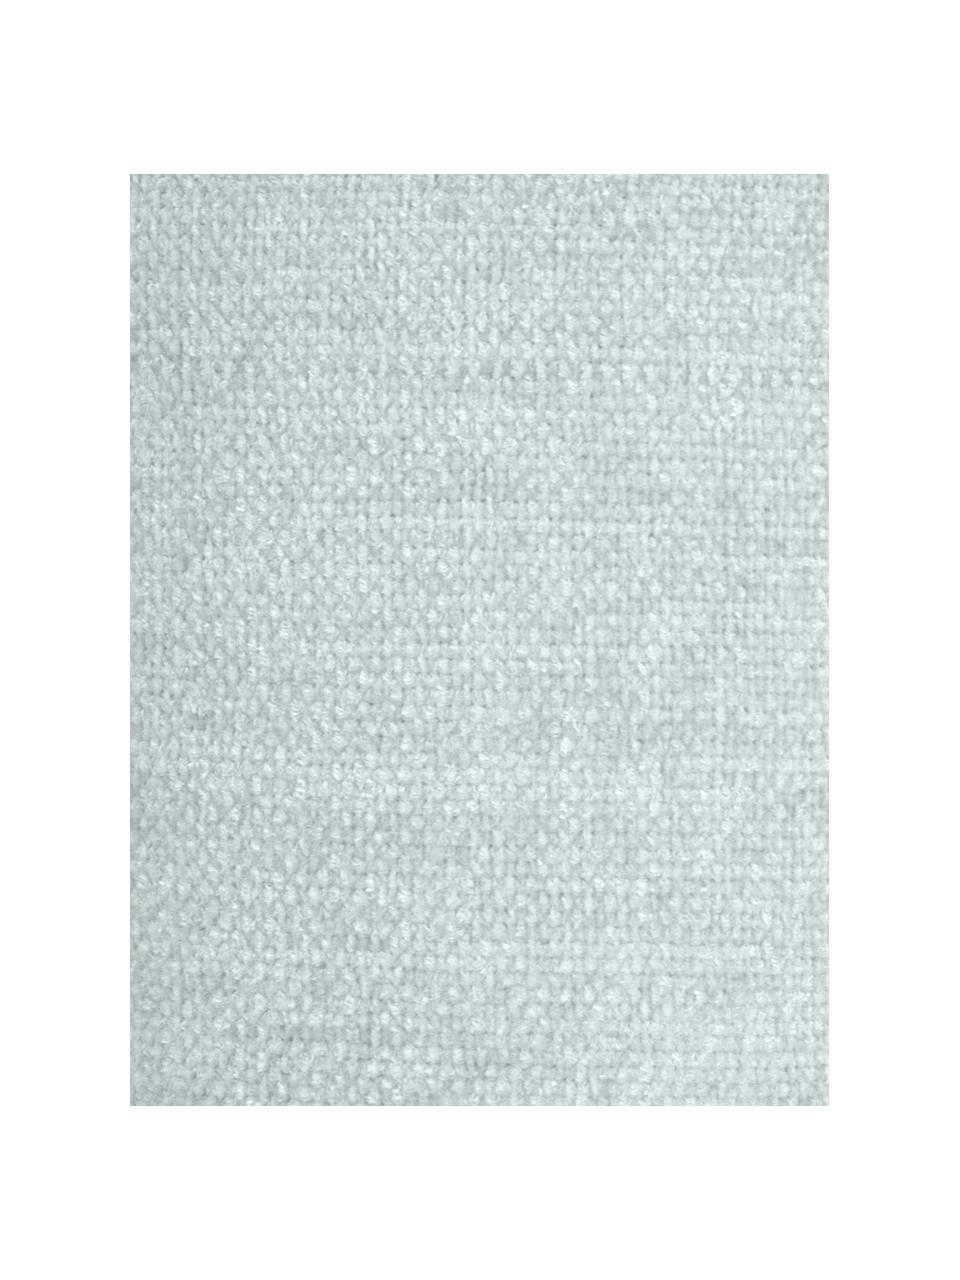 Zachte chenille plaid Chila met franjes, 100% polyester, Blauw, 125 x 150 cm